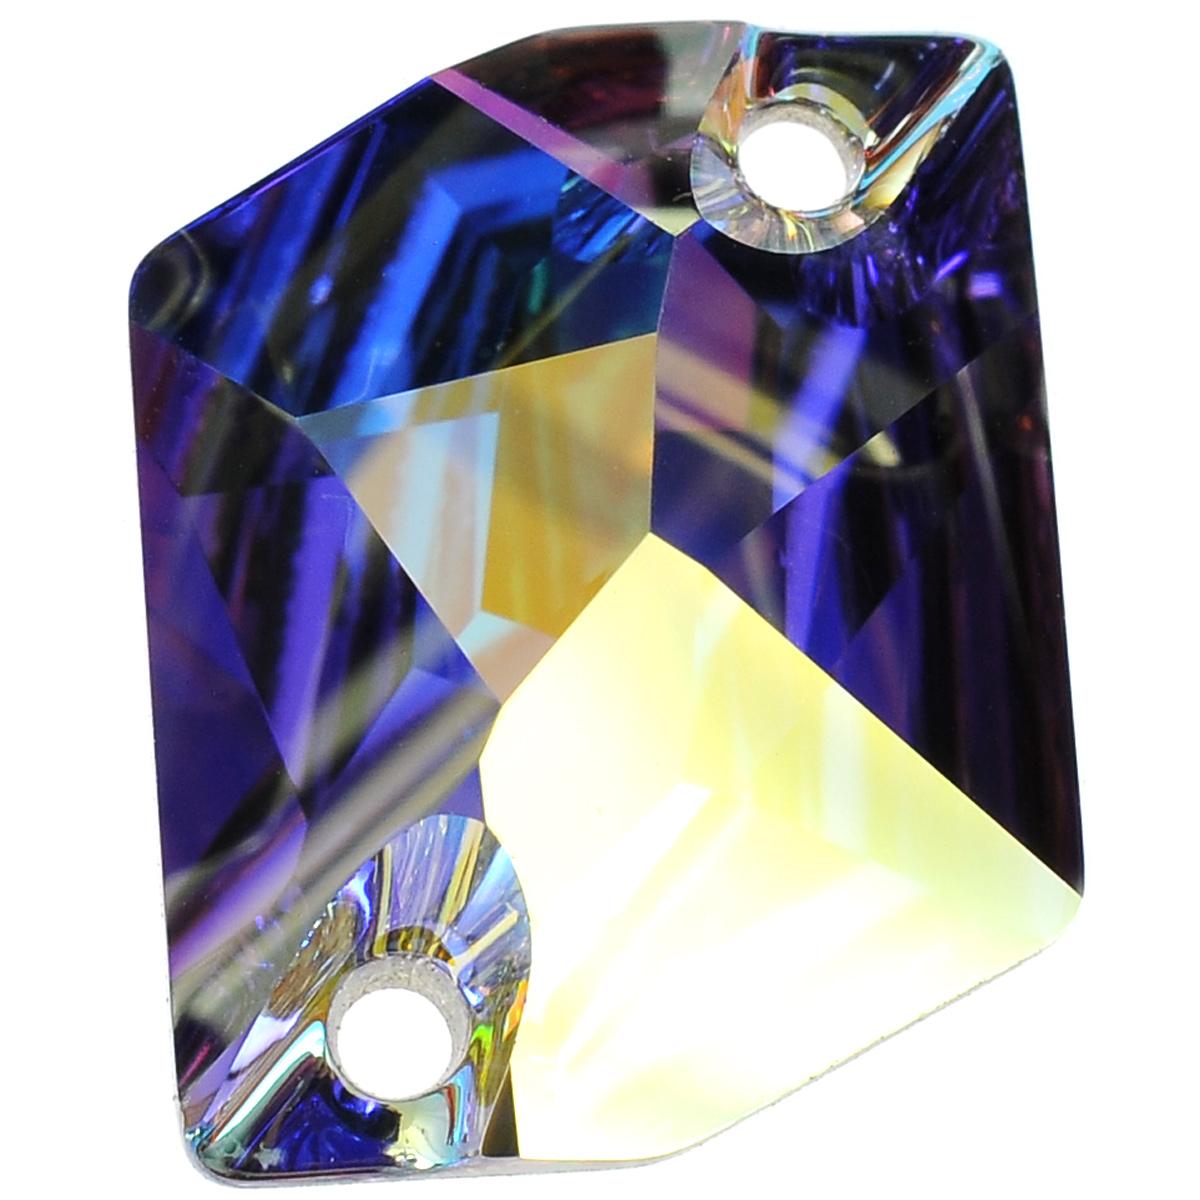 Камень нашивной Swarovski Elements, цвет: перламутровый (crystal AB), 20 мм х 16 мм zu elements zu003emnsw70